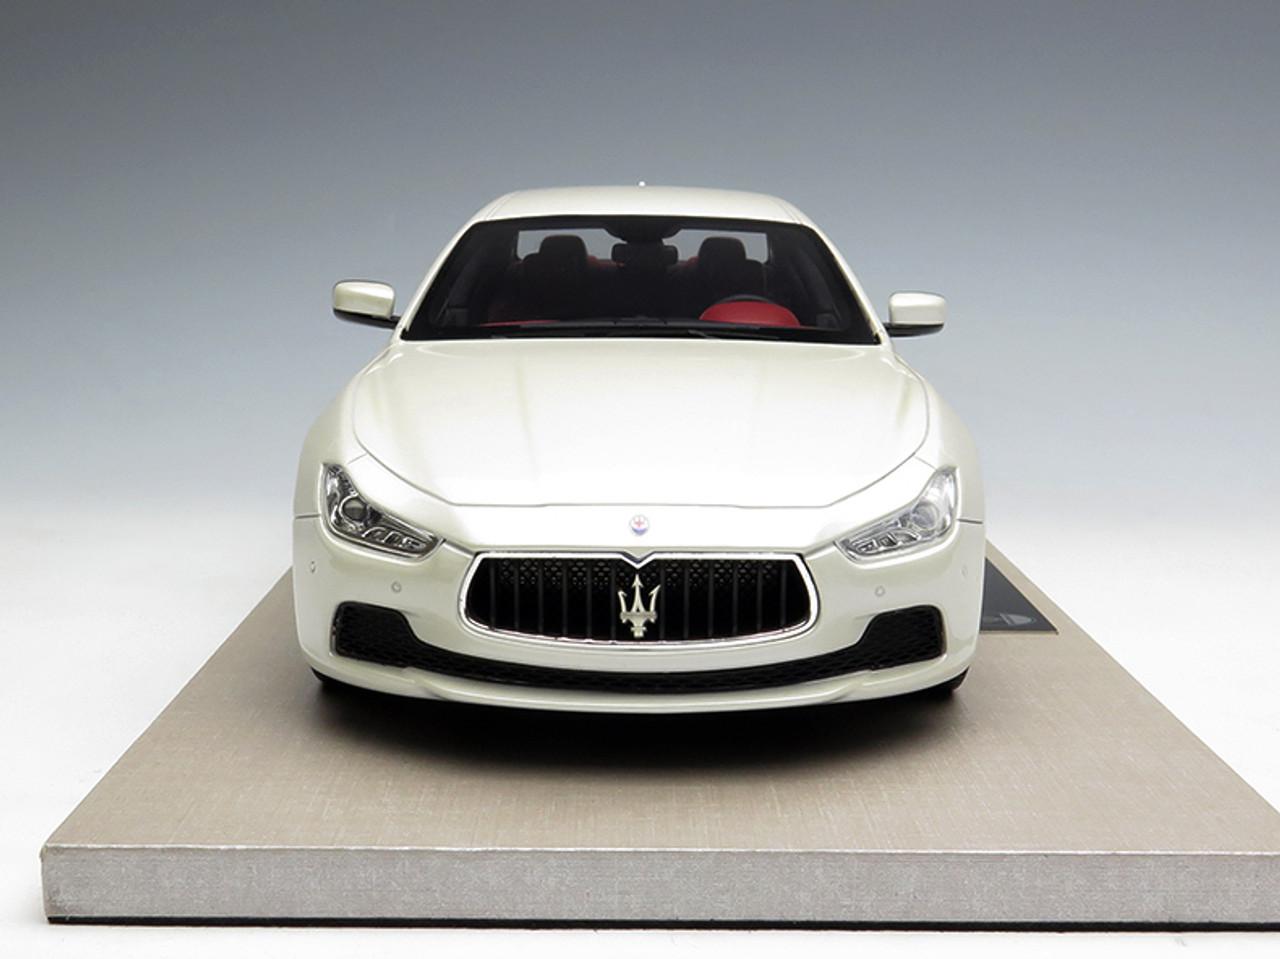 1/18 BBR Top Marques Maserati Ghibli (White)